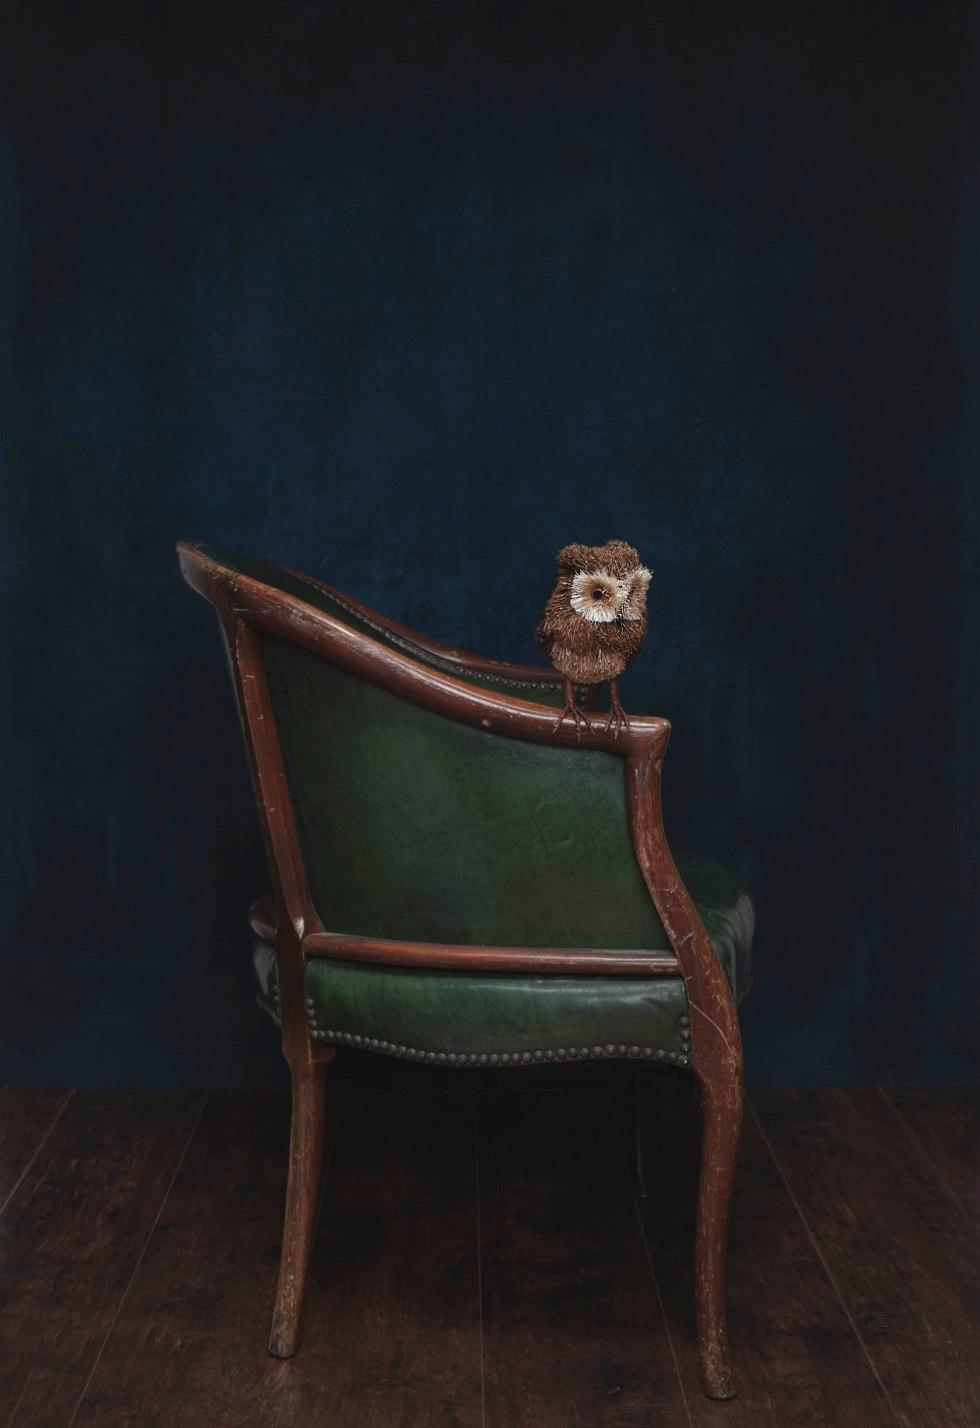 Owlonoldchair